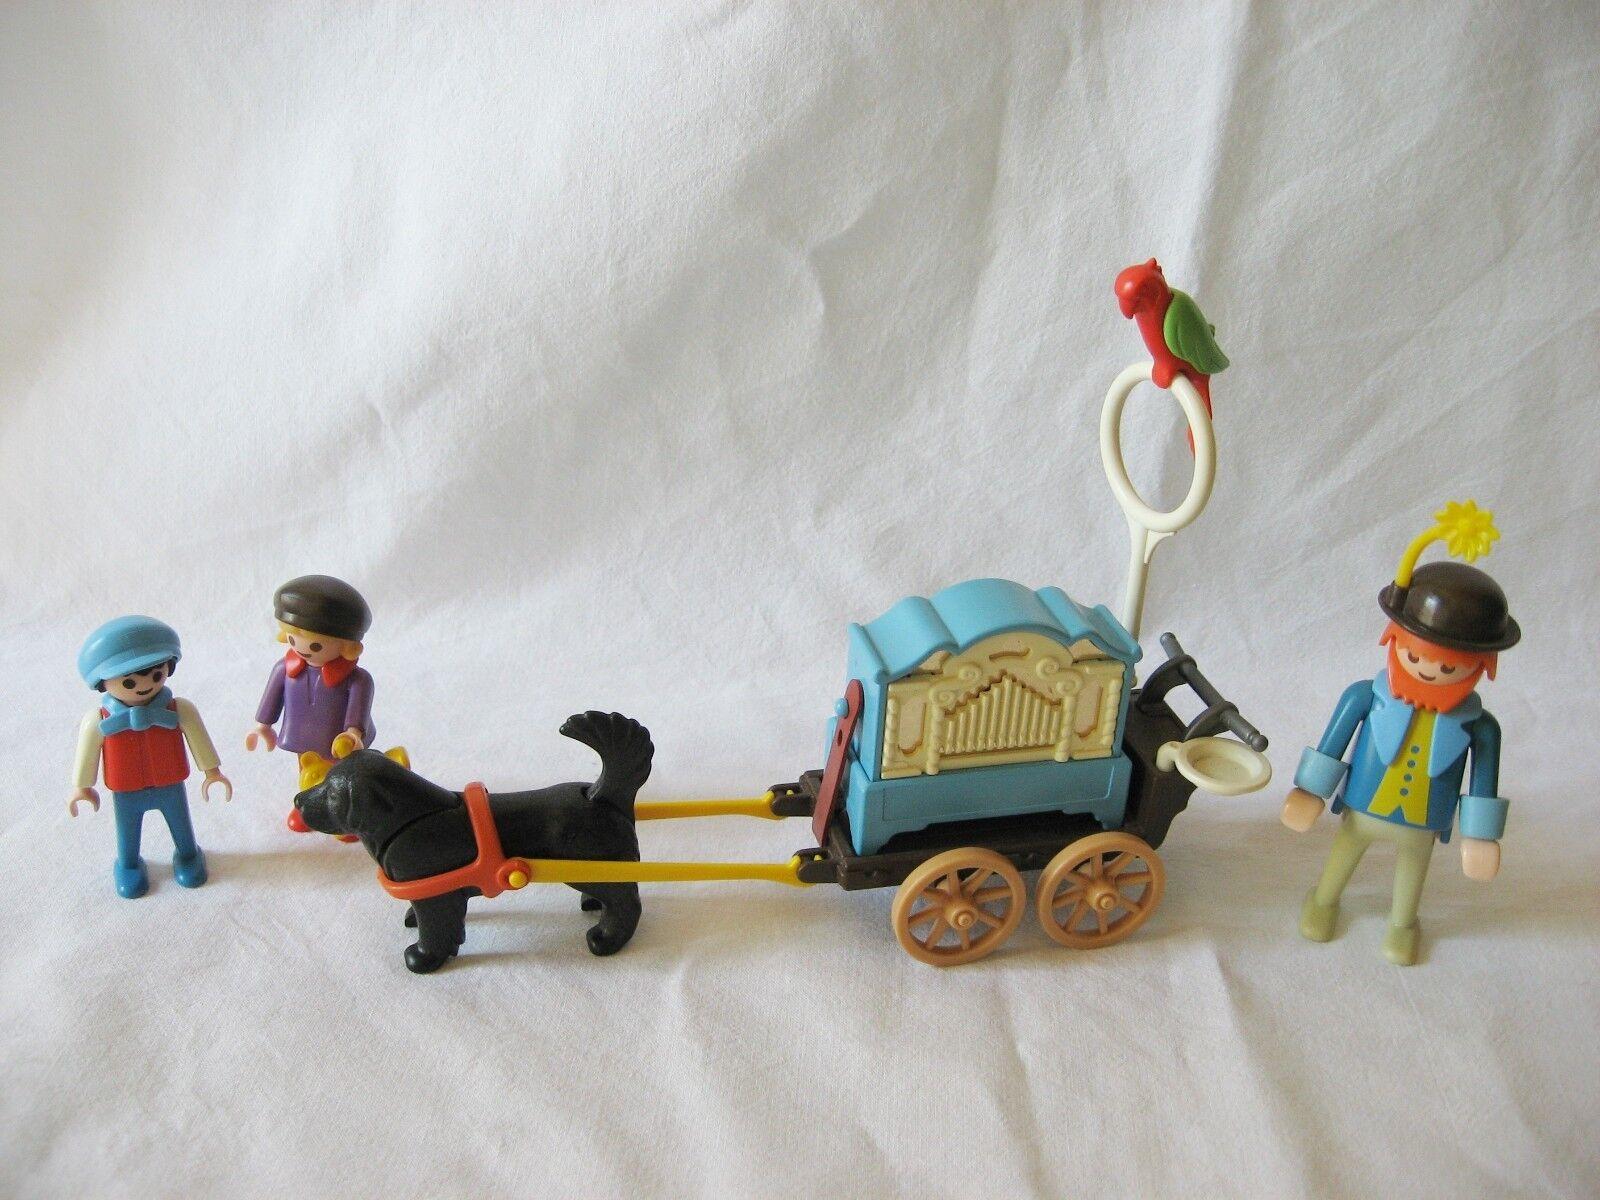 Drehorgel-Spieler 5550 Playmobil Nostalgie 5505 Rosa Serie Puppenhaus 1990